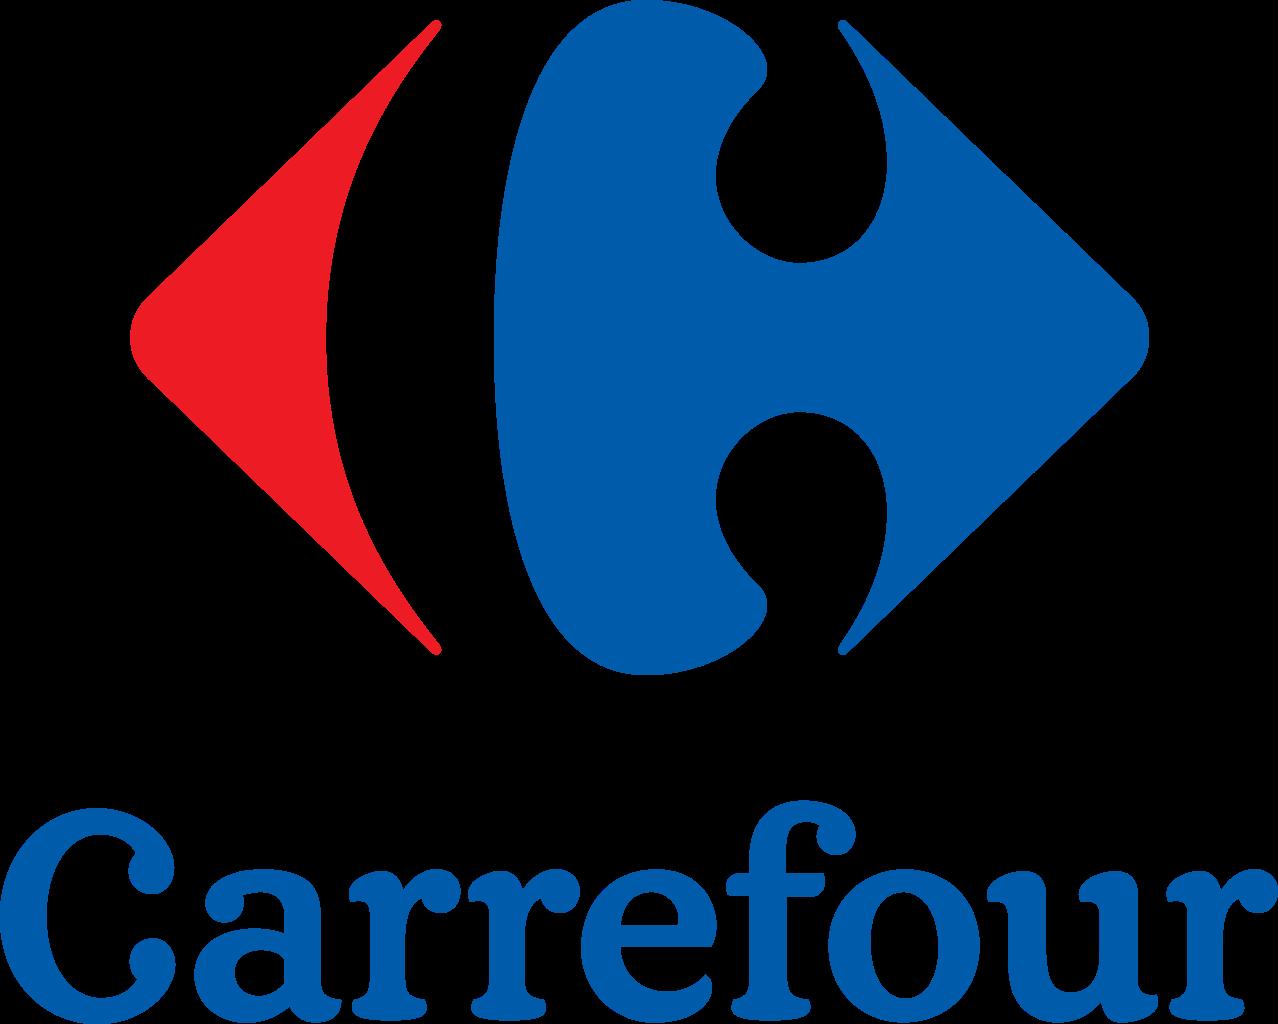 Logo_Carrefour-svg.png